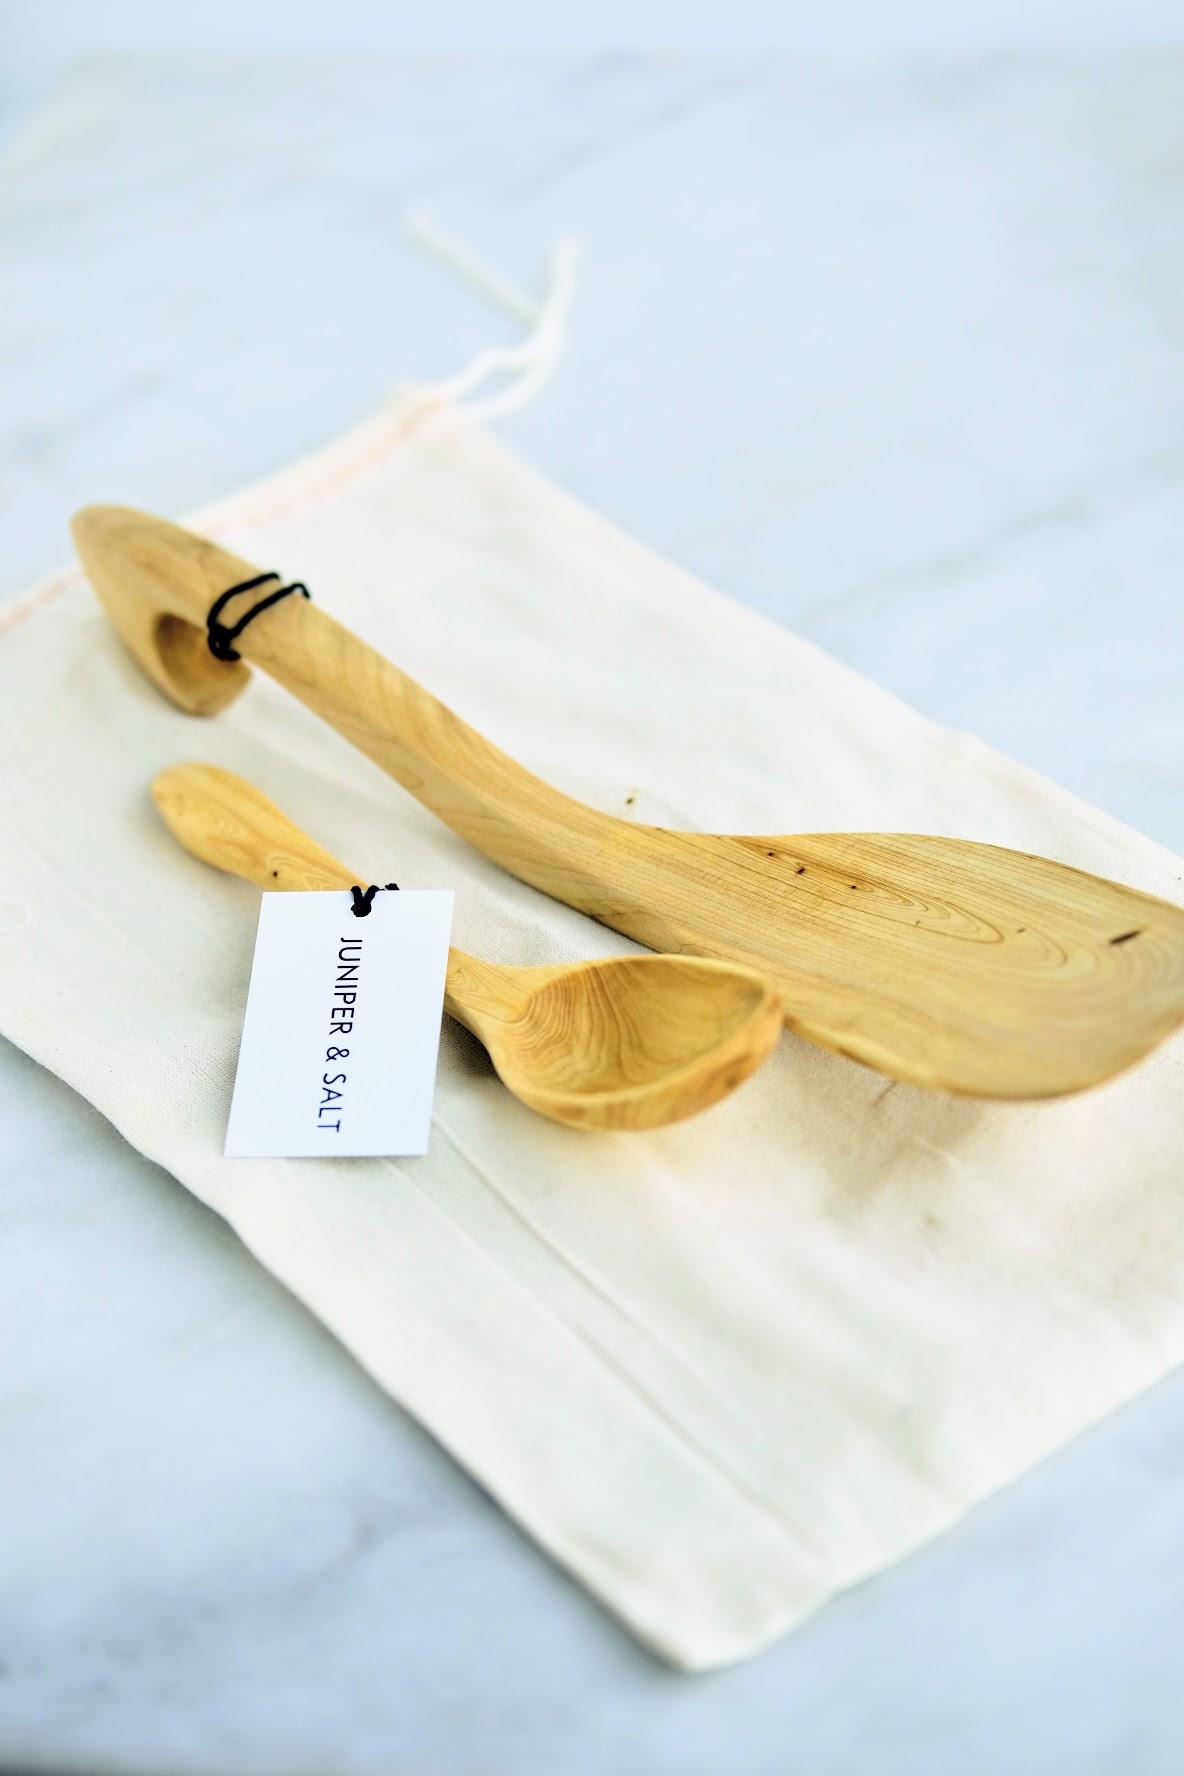 juniper & salt wooden spoon product reviews